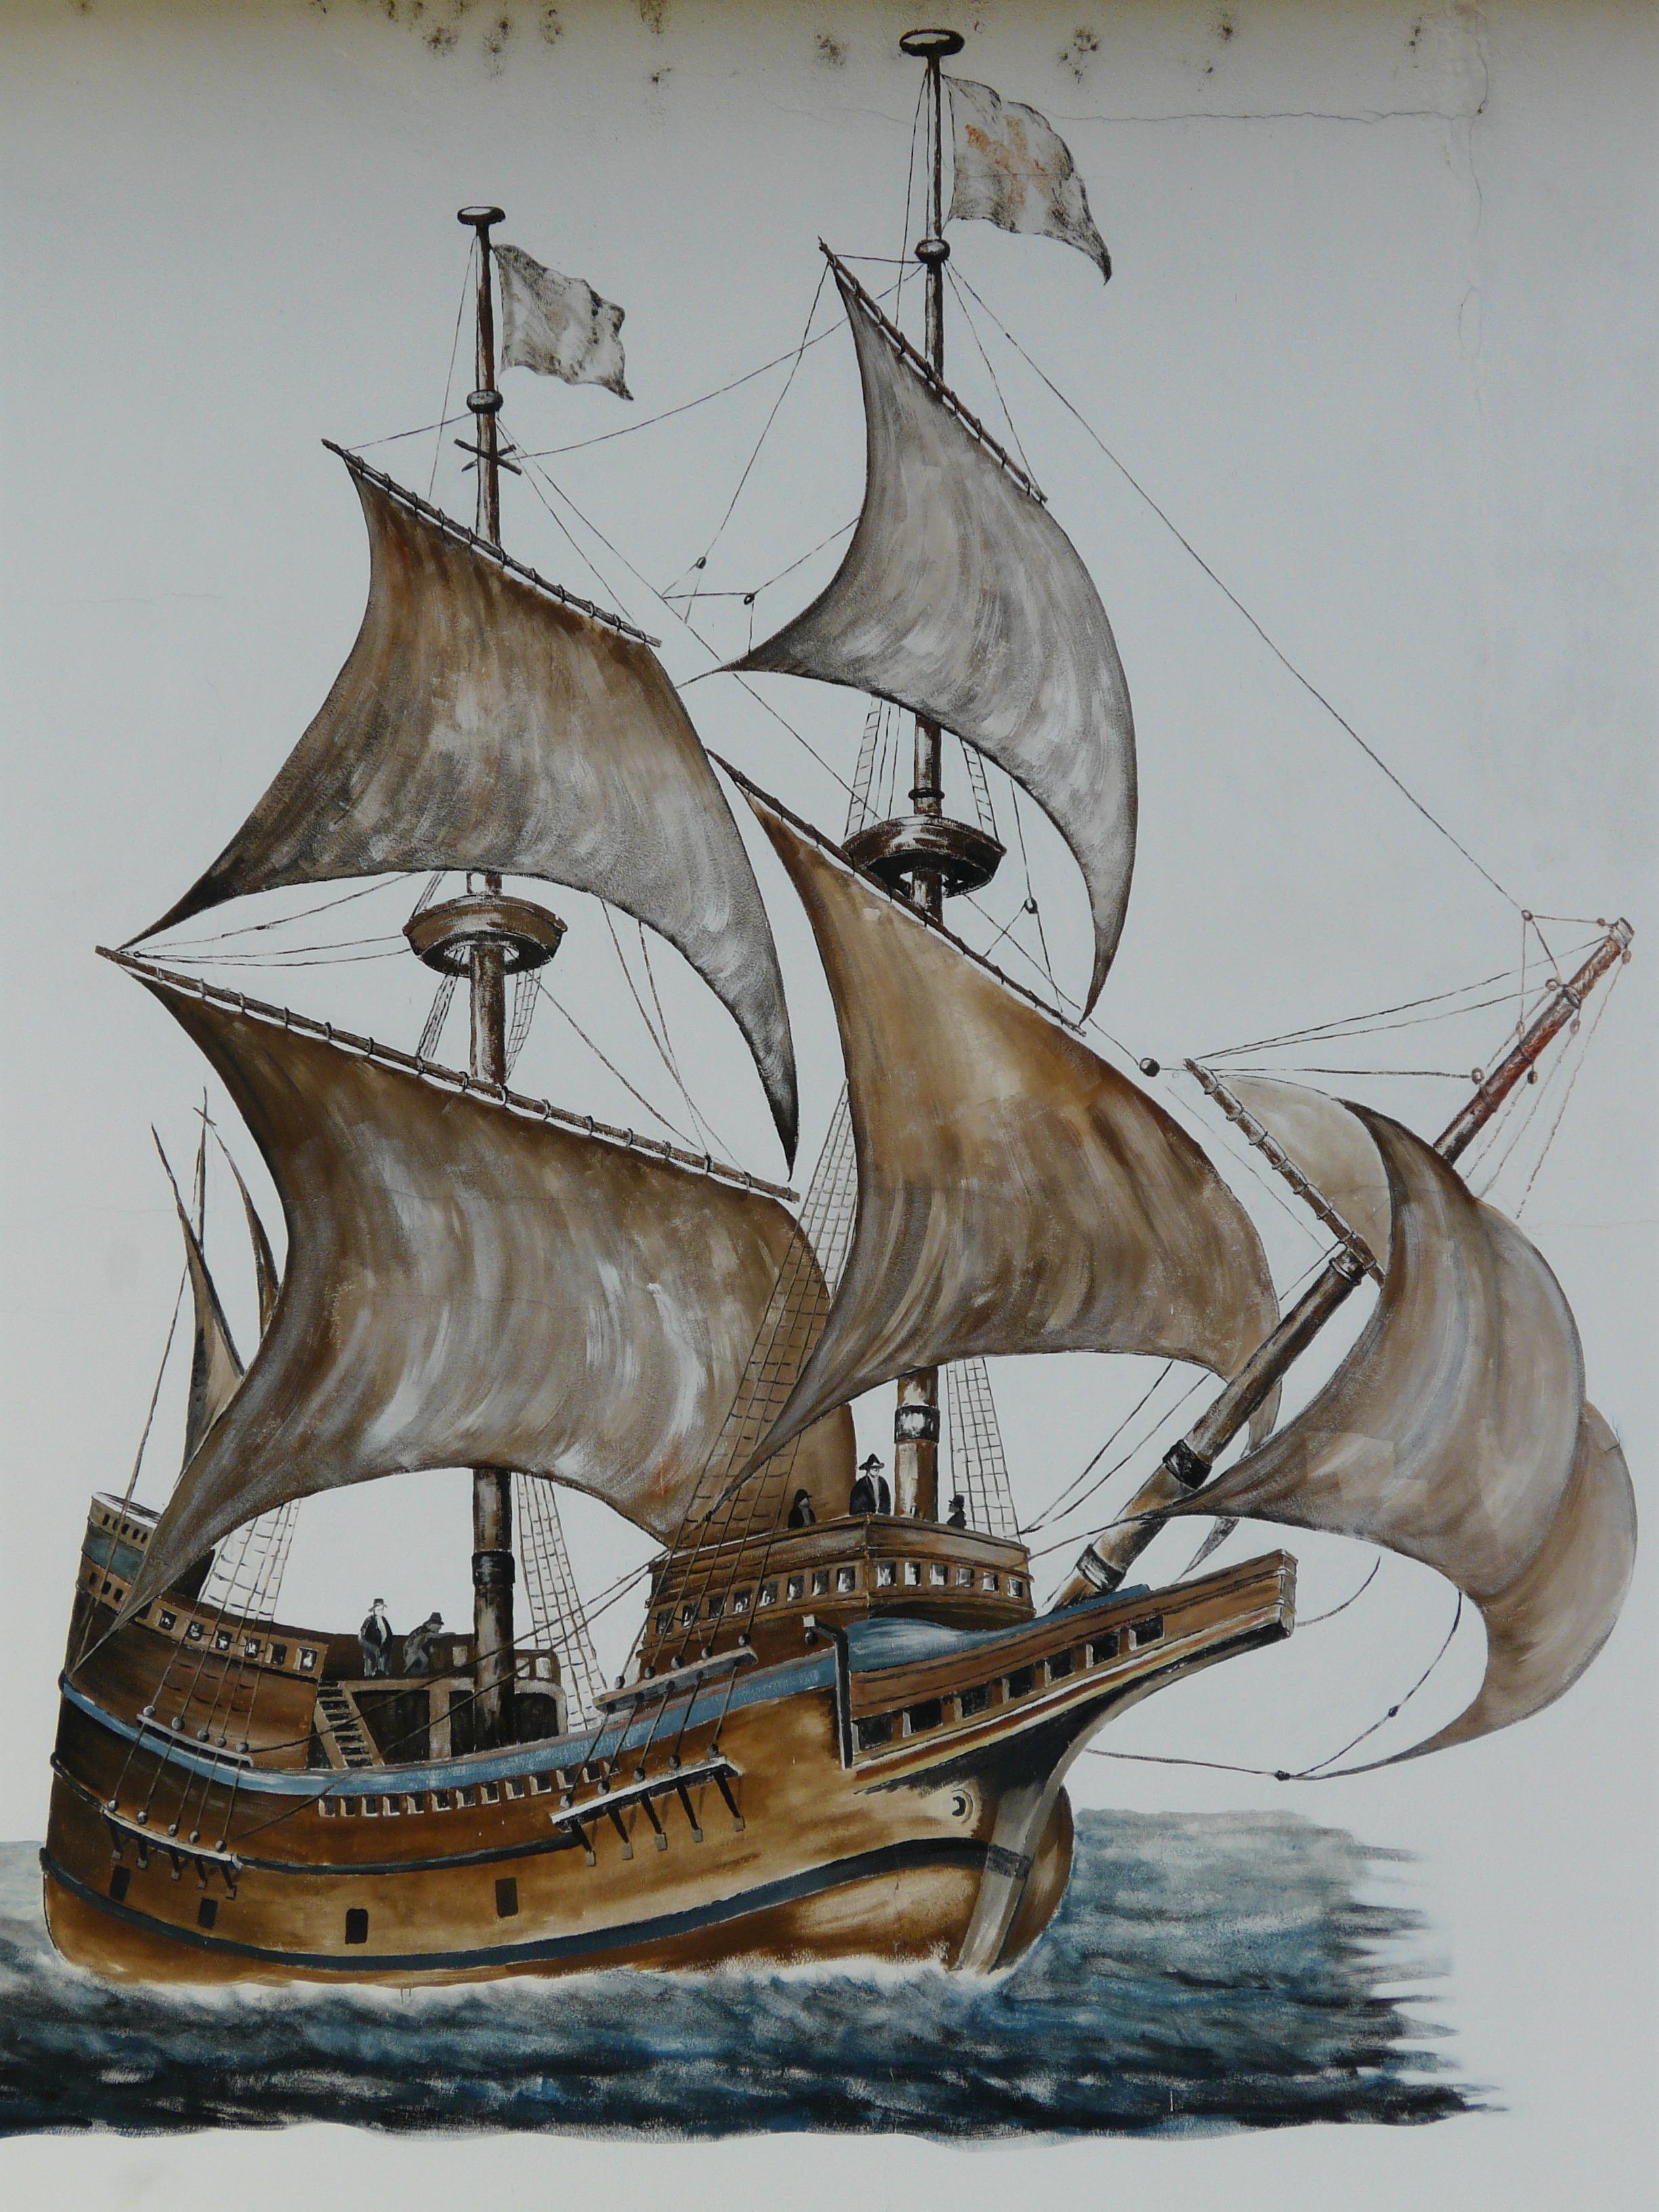 Gambar Air Sepatu Bot Kendaraan Perahu Layar Sketsa Gambar